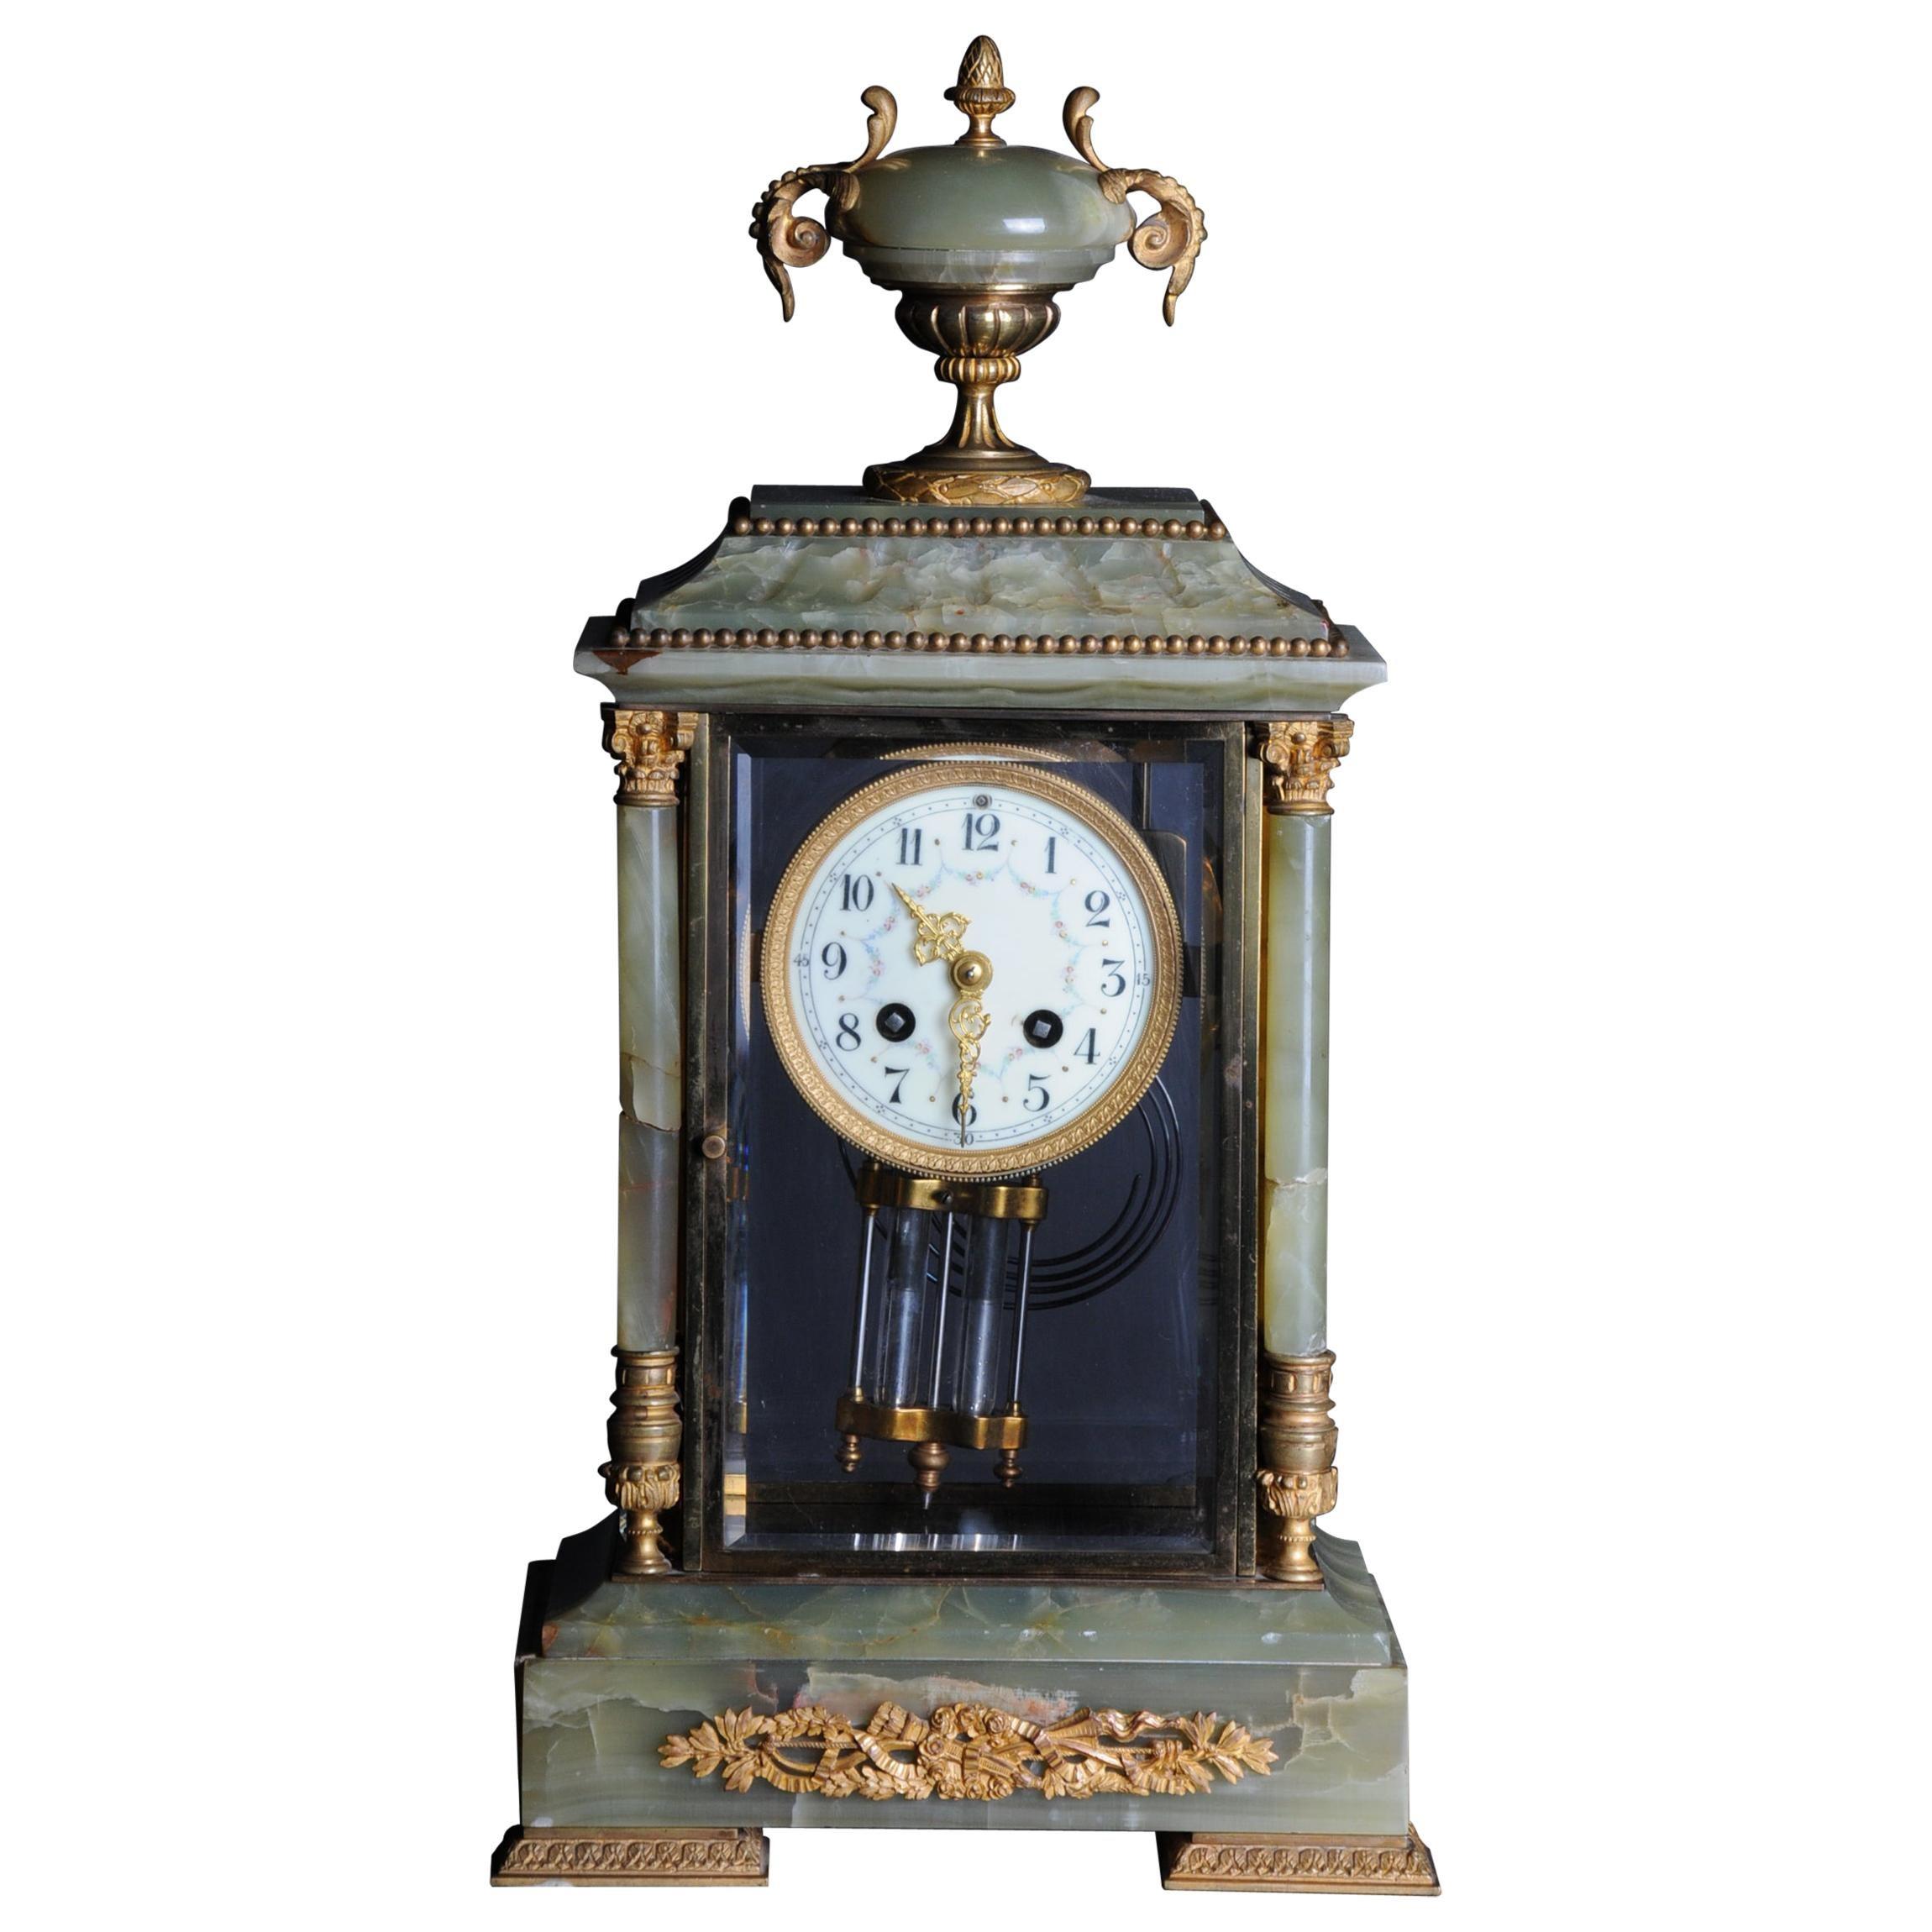 19th Century French Fireplace Clock Onyx 1889 L.Marti et Cie Napoleon III